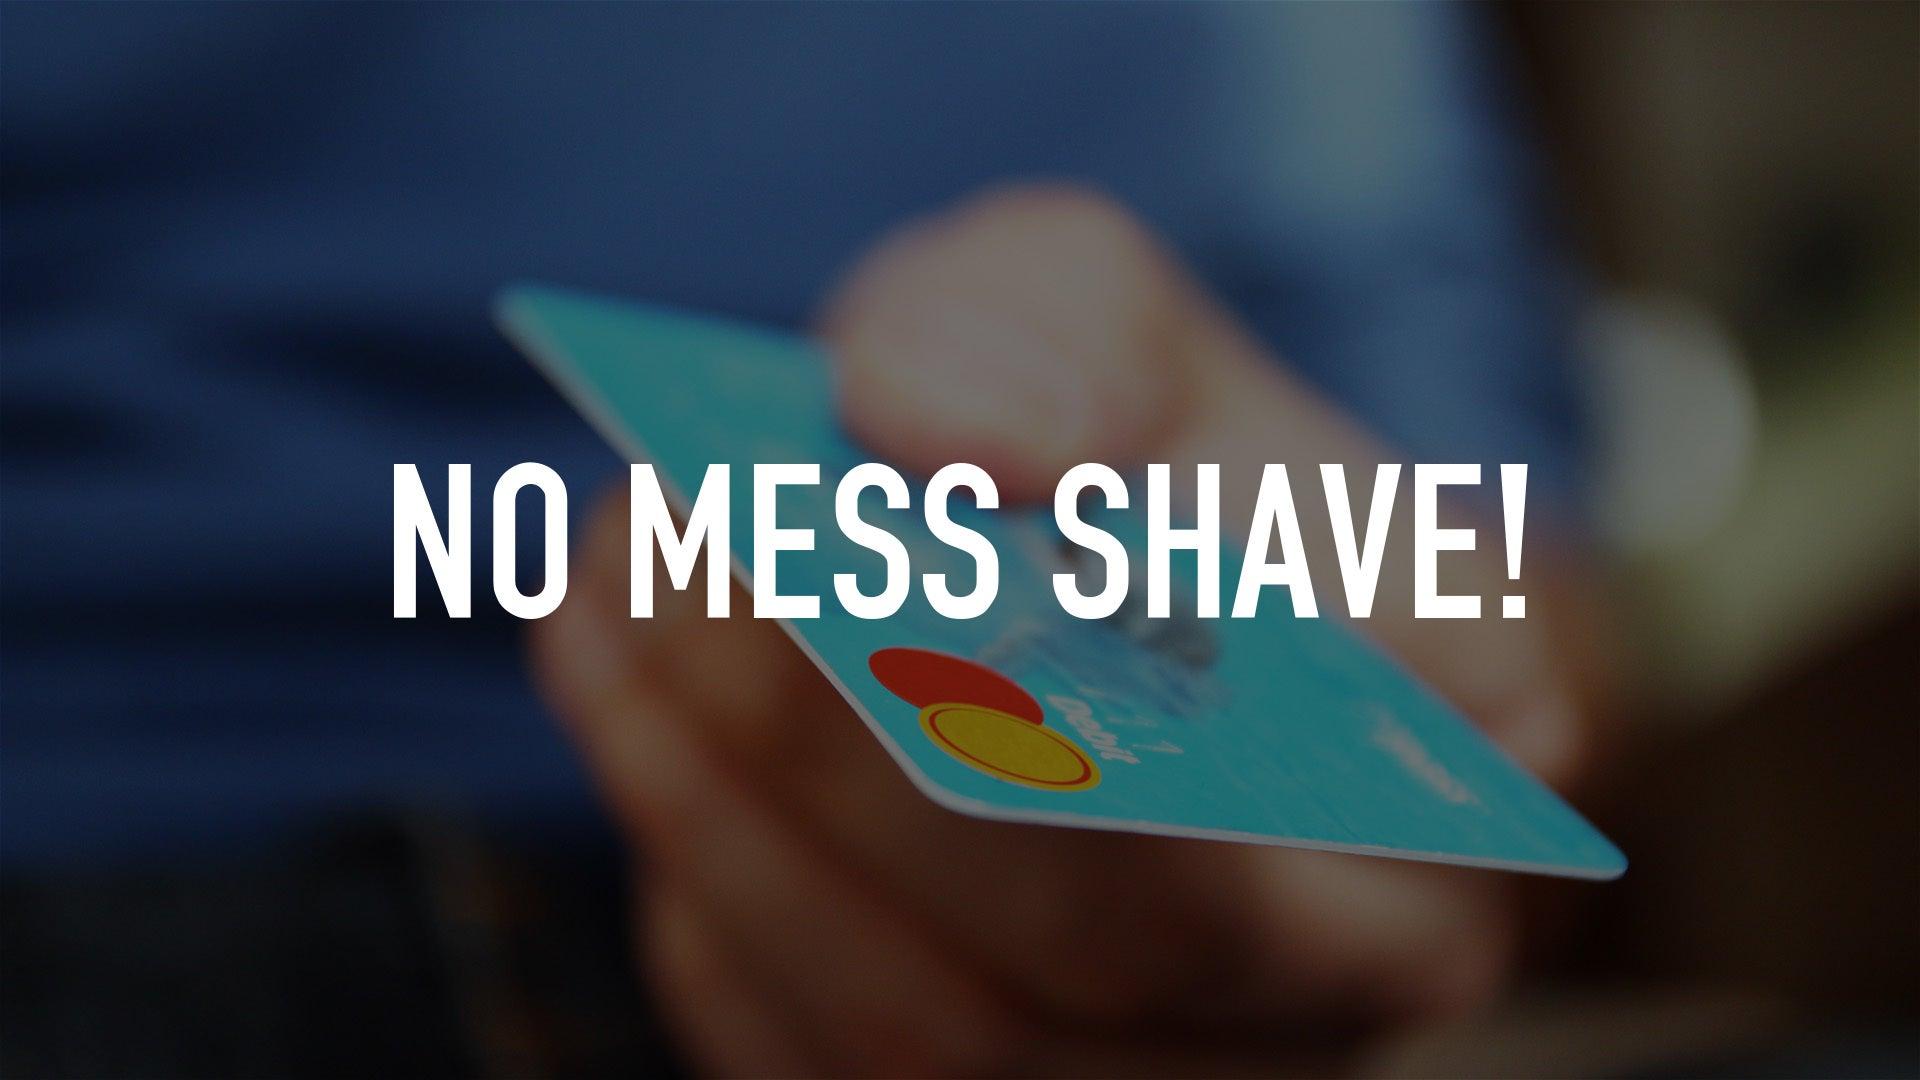 No Mess Shave!